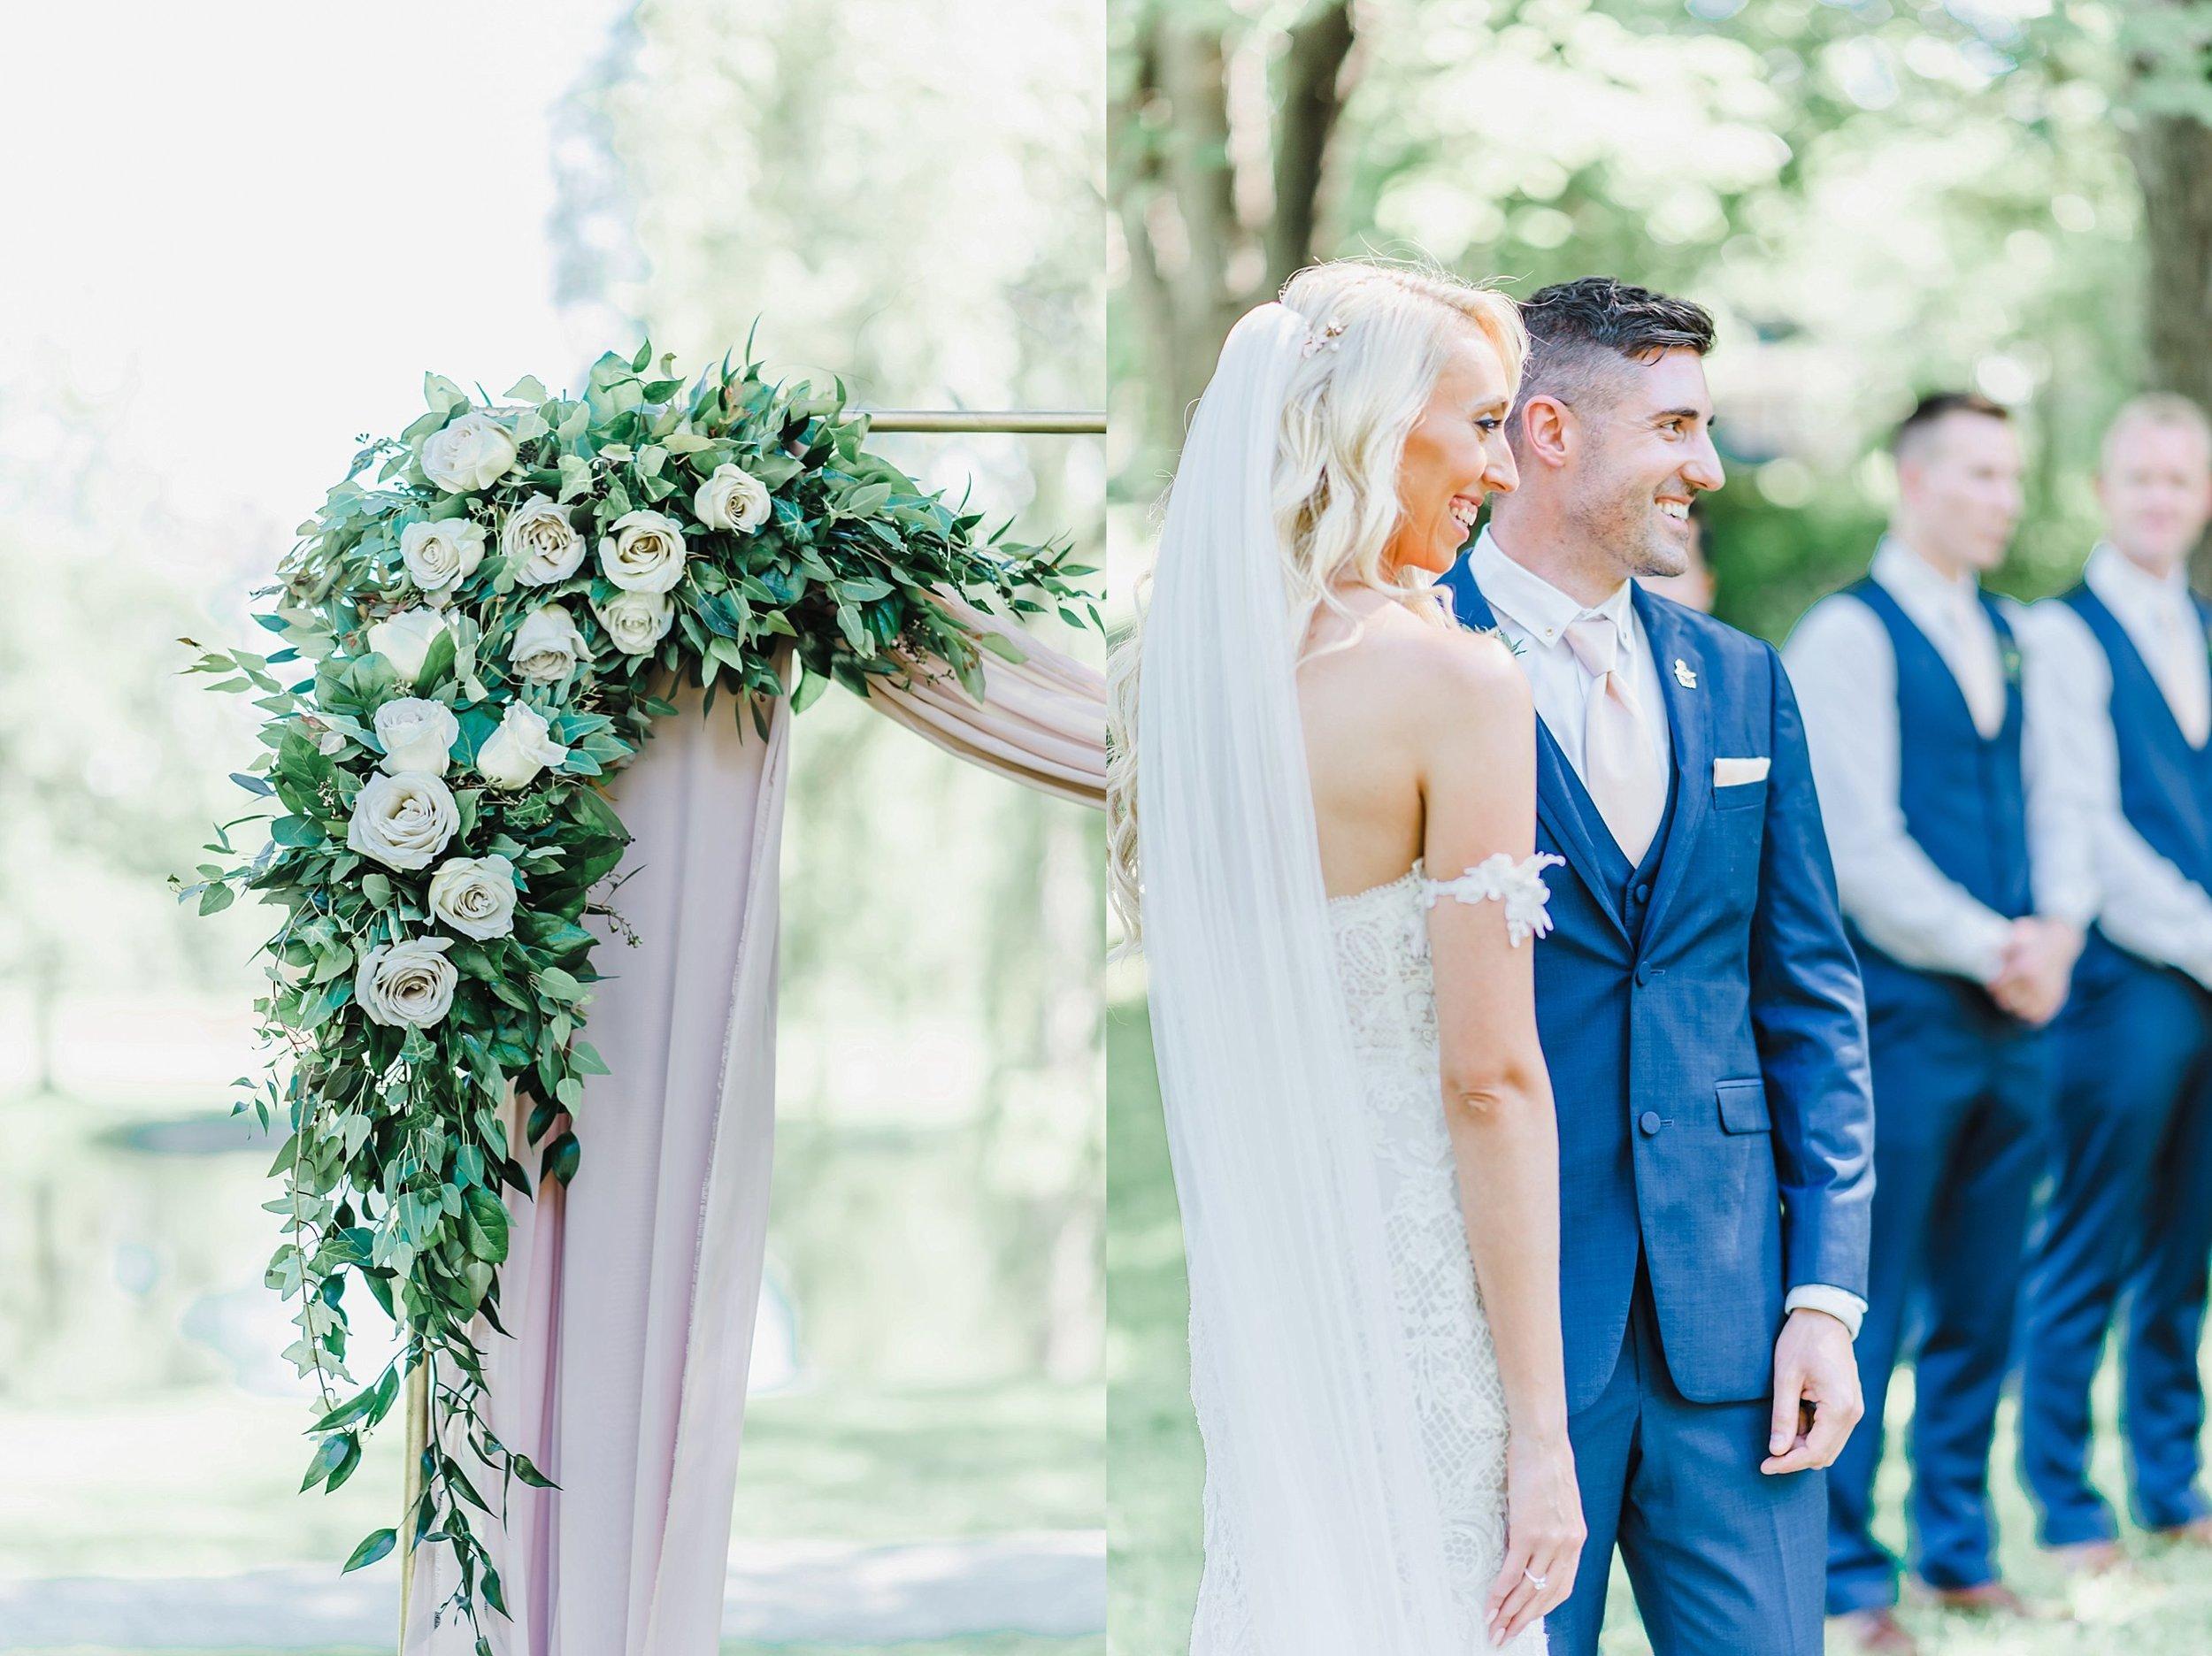 light airy indie fine art ottawa wedding photographer | Ali and Batoul Photography_0064.jpg